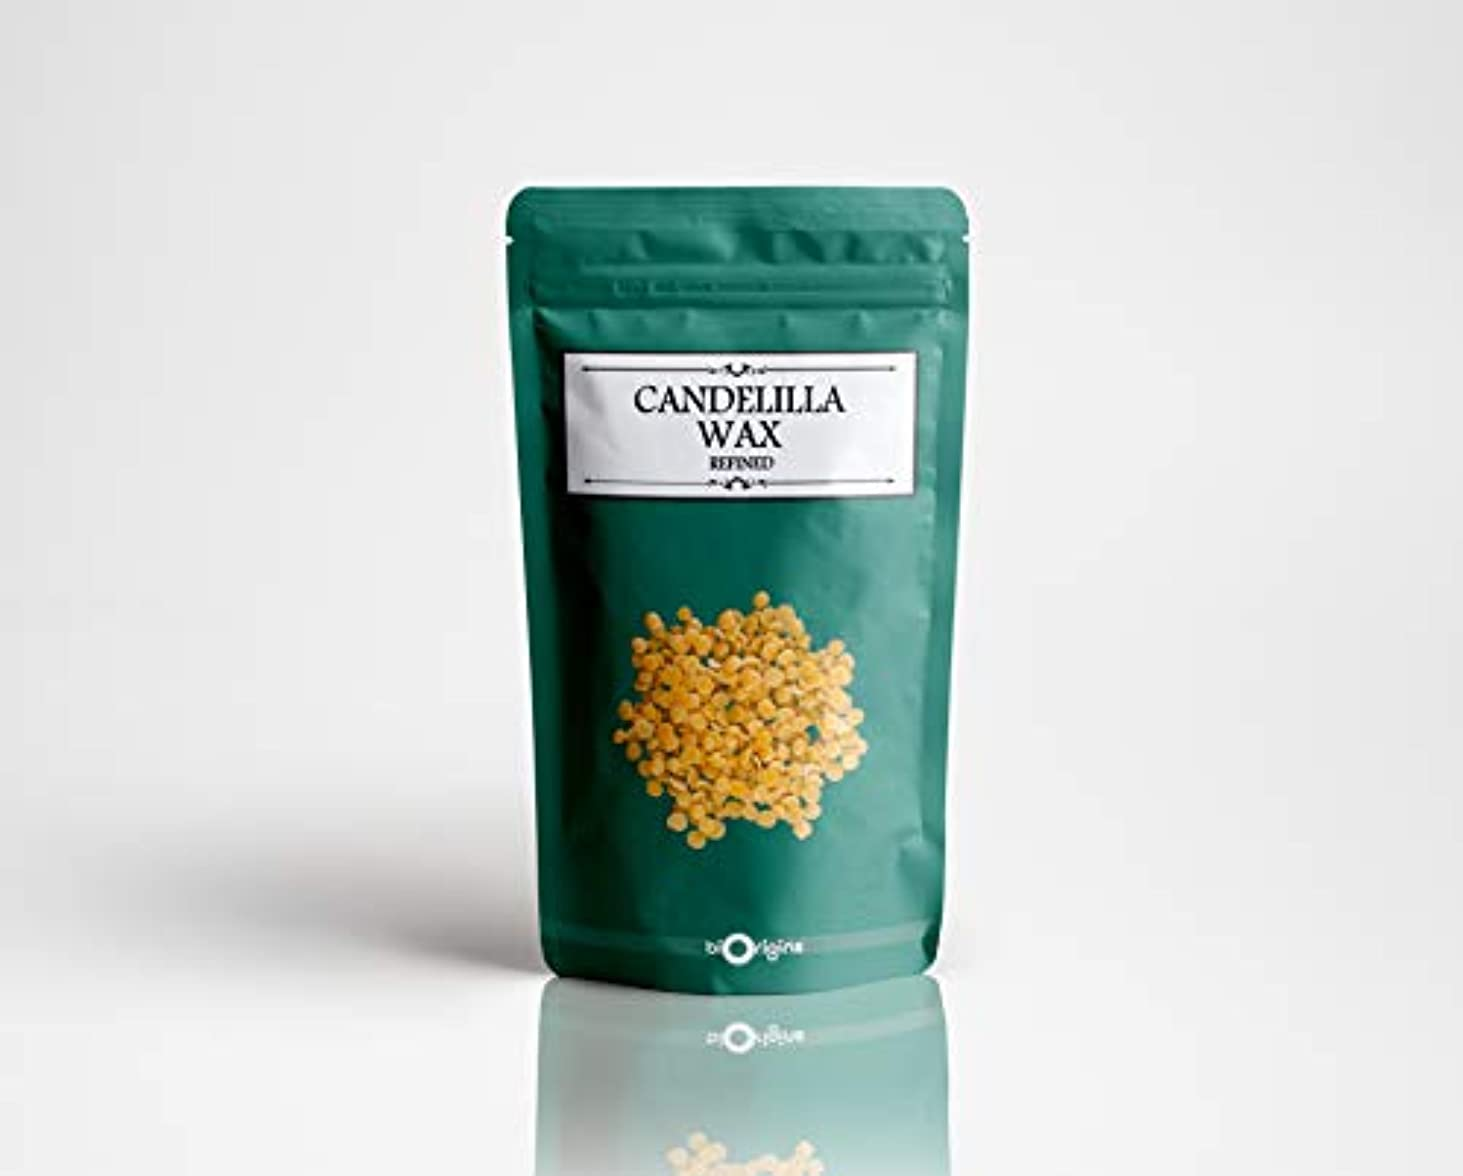 Candelilla Wax 100g